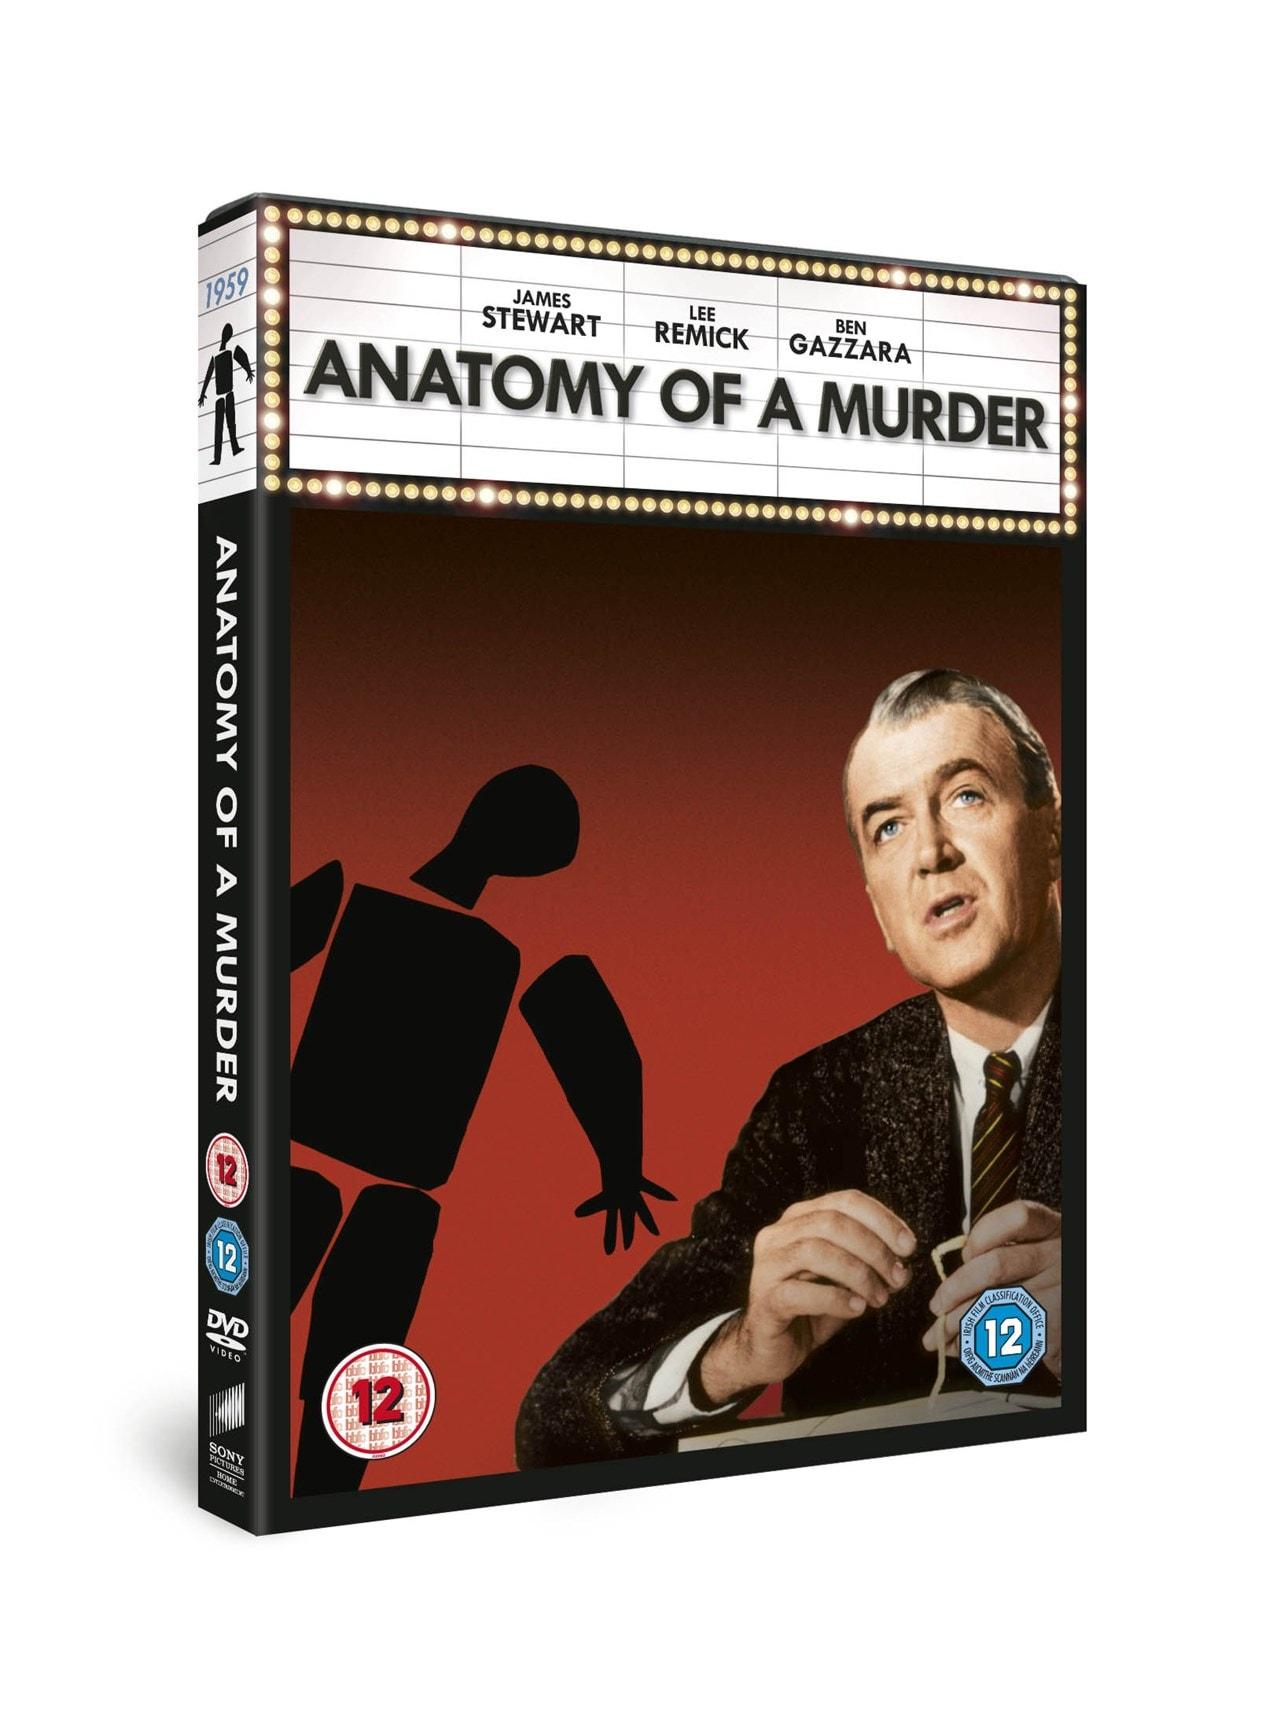 Anatomy of a Murder - 1